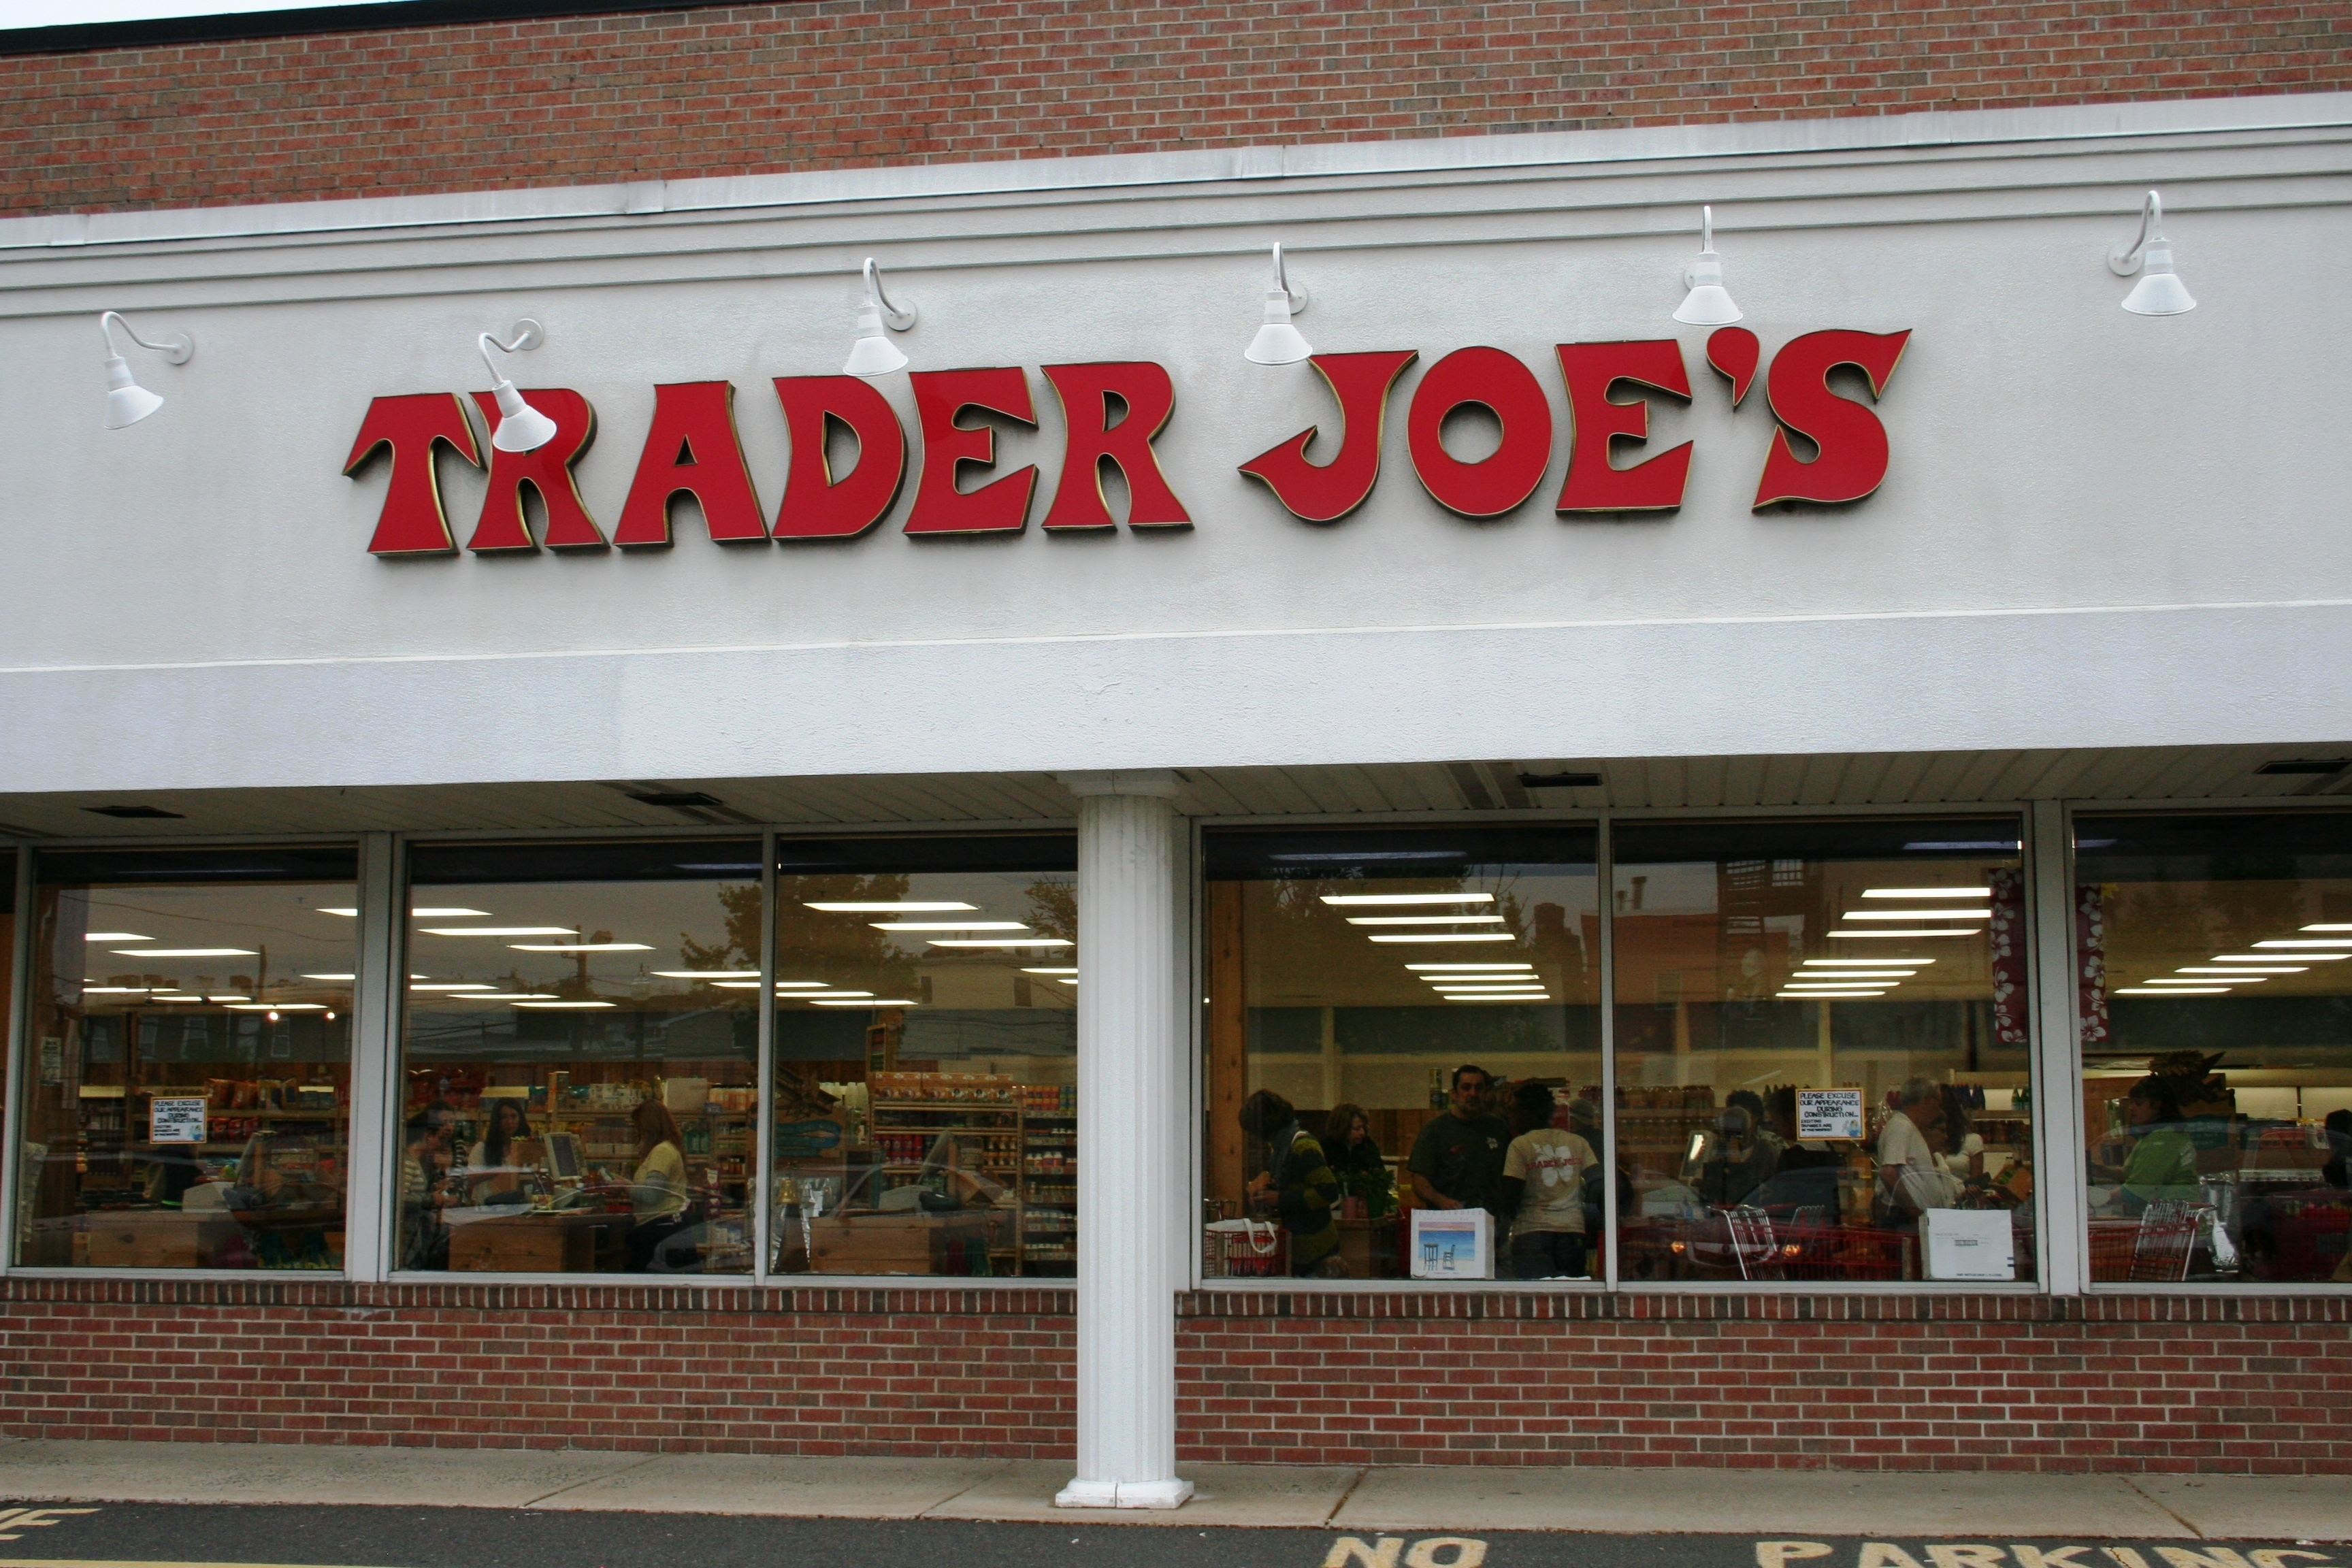 a3dc61c1eb8b73e9aca3_trader_joe_s.JPG